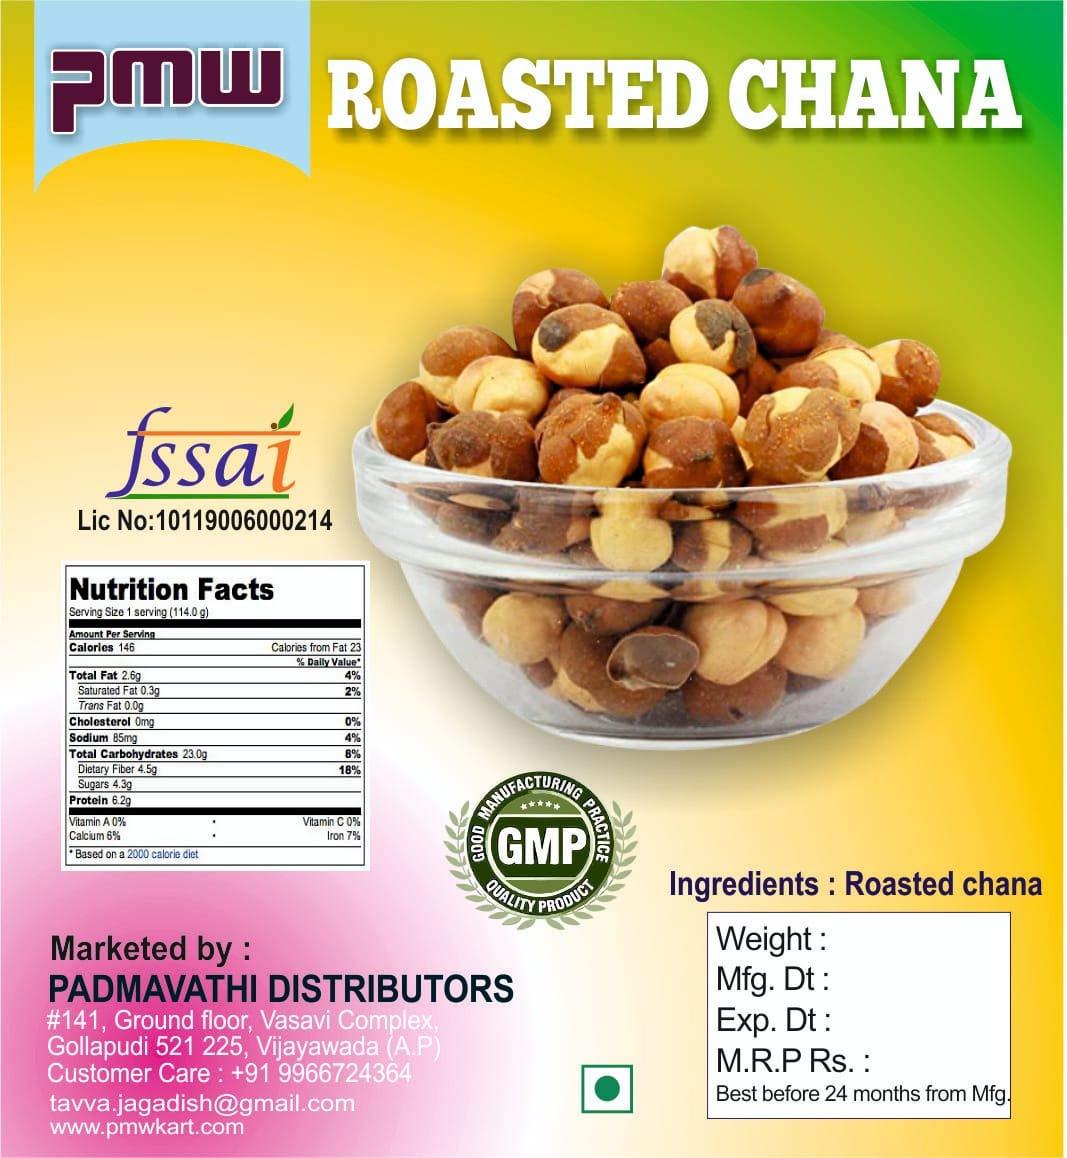 Pmw Dry Roasted Chick Peas Black Chana Garbanzo Beans Uppu Senagalu Slightly Salted 250 Grams Amazon In Grocery Gourmet Foods